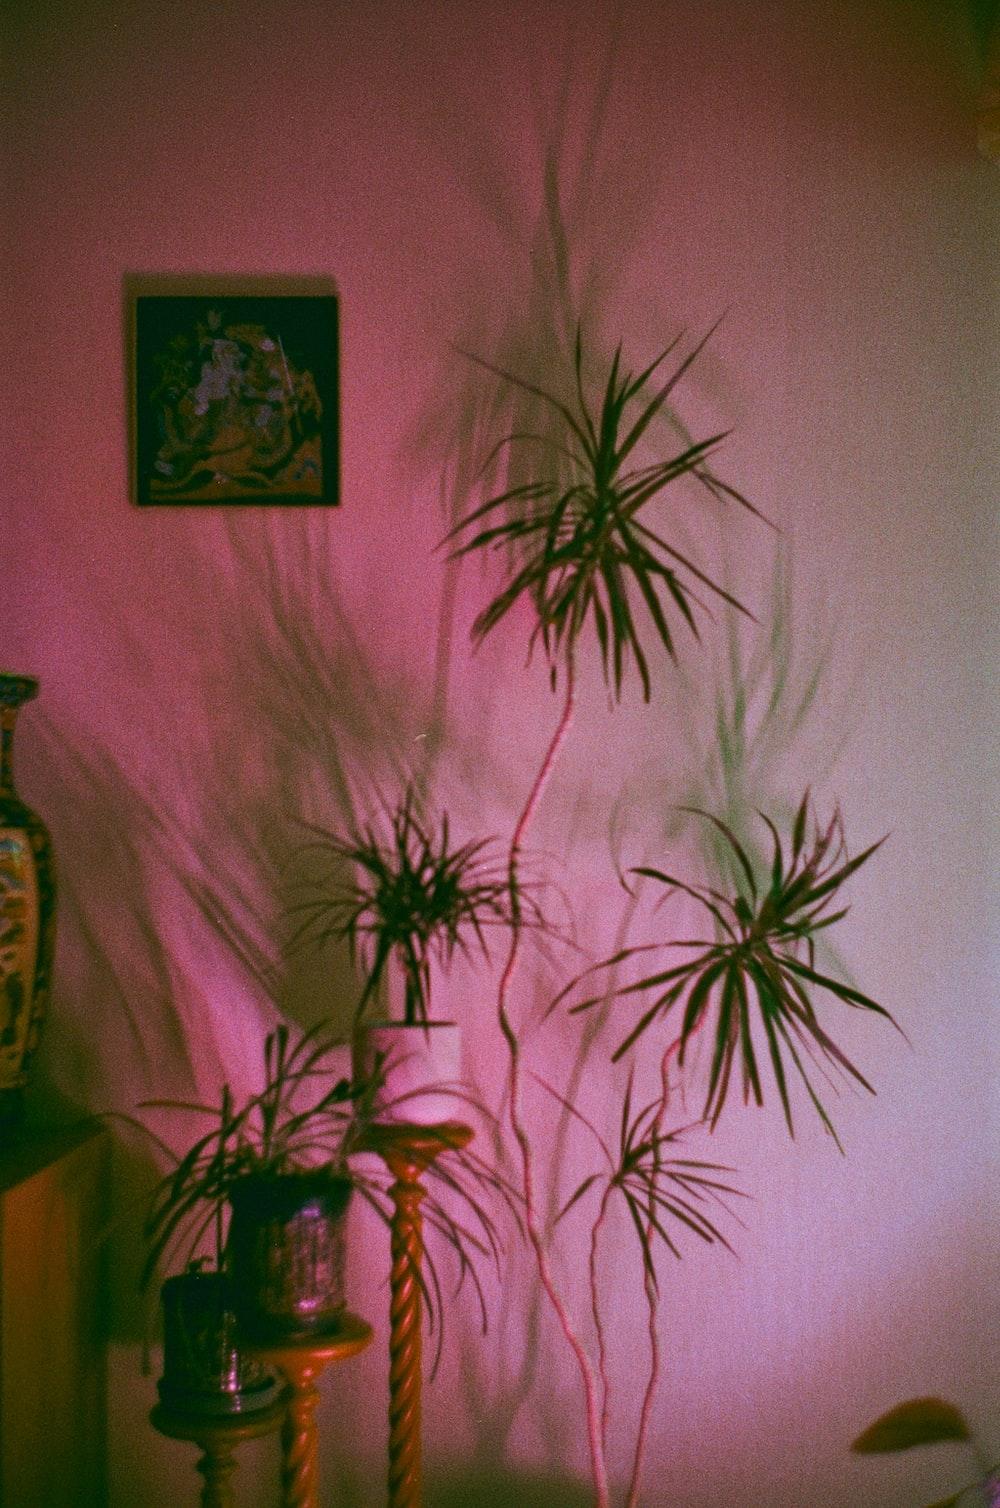 green palm plant near white wall